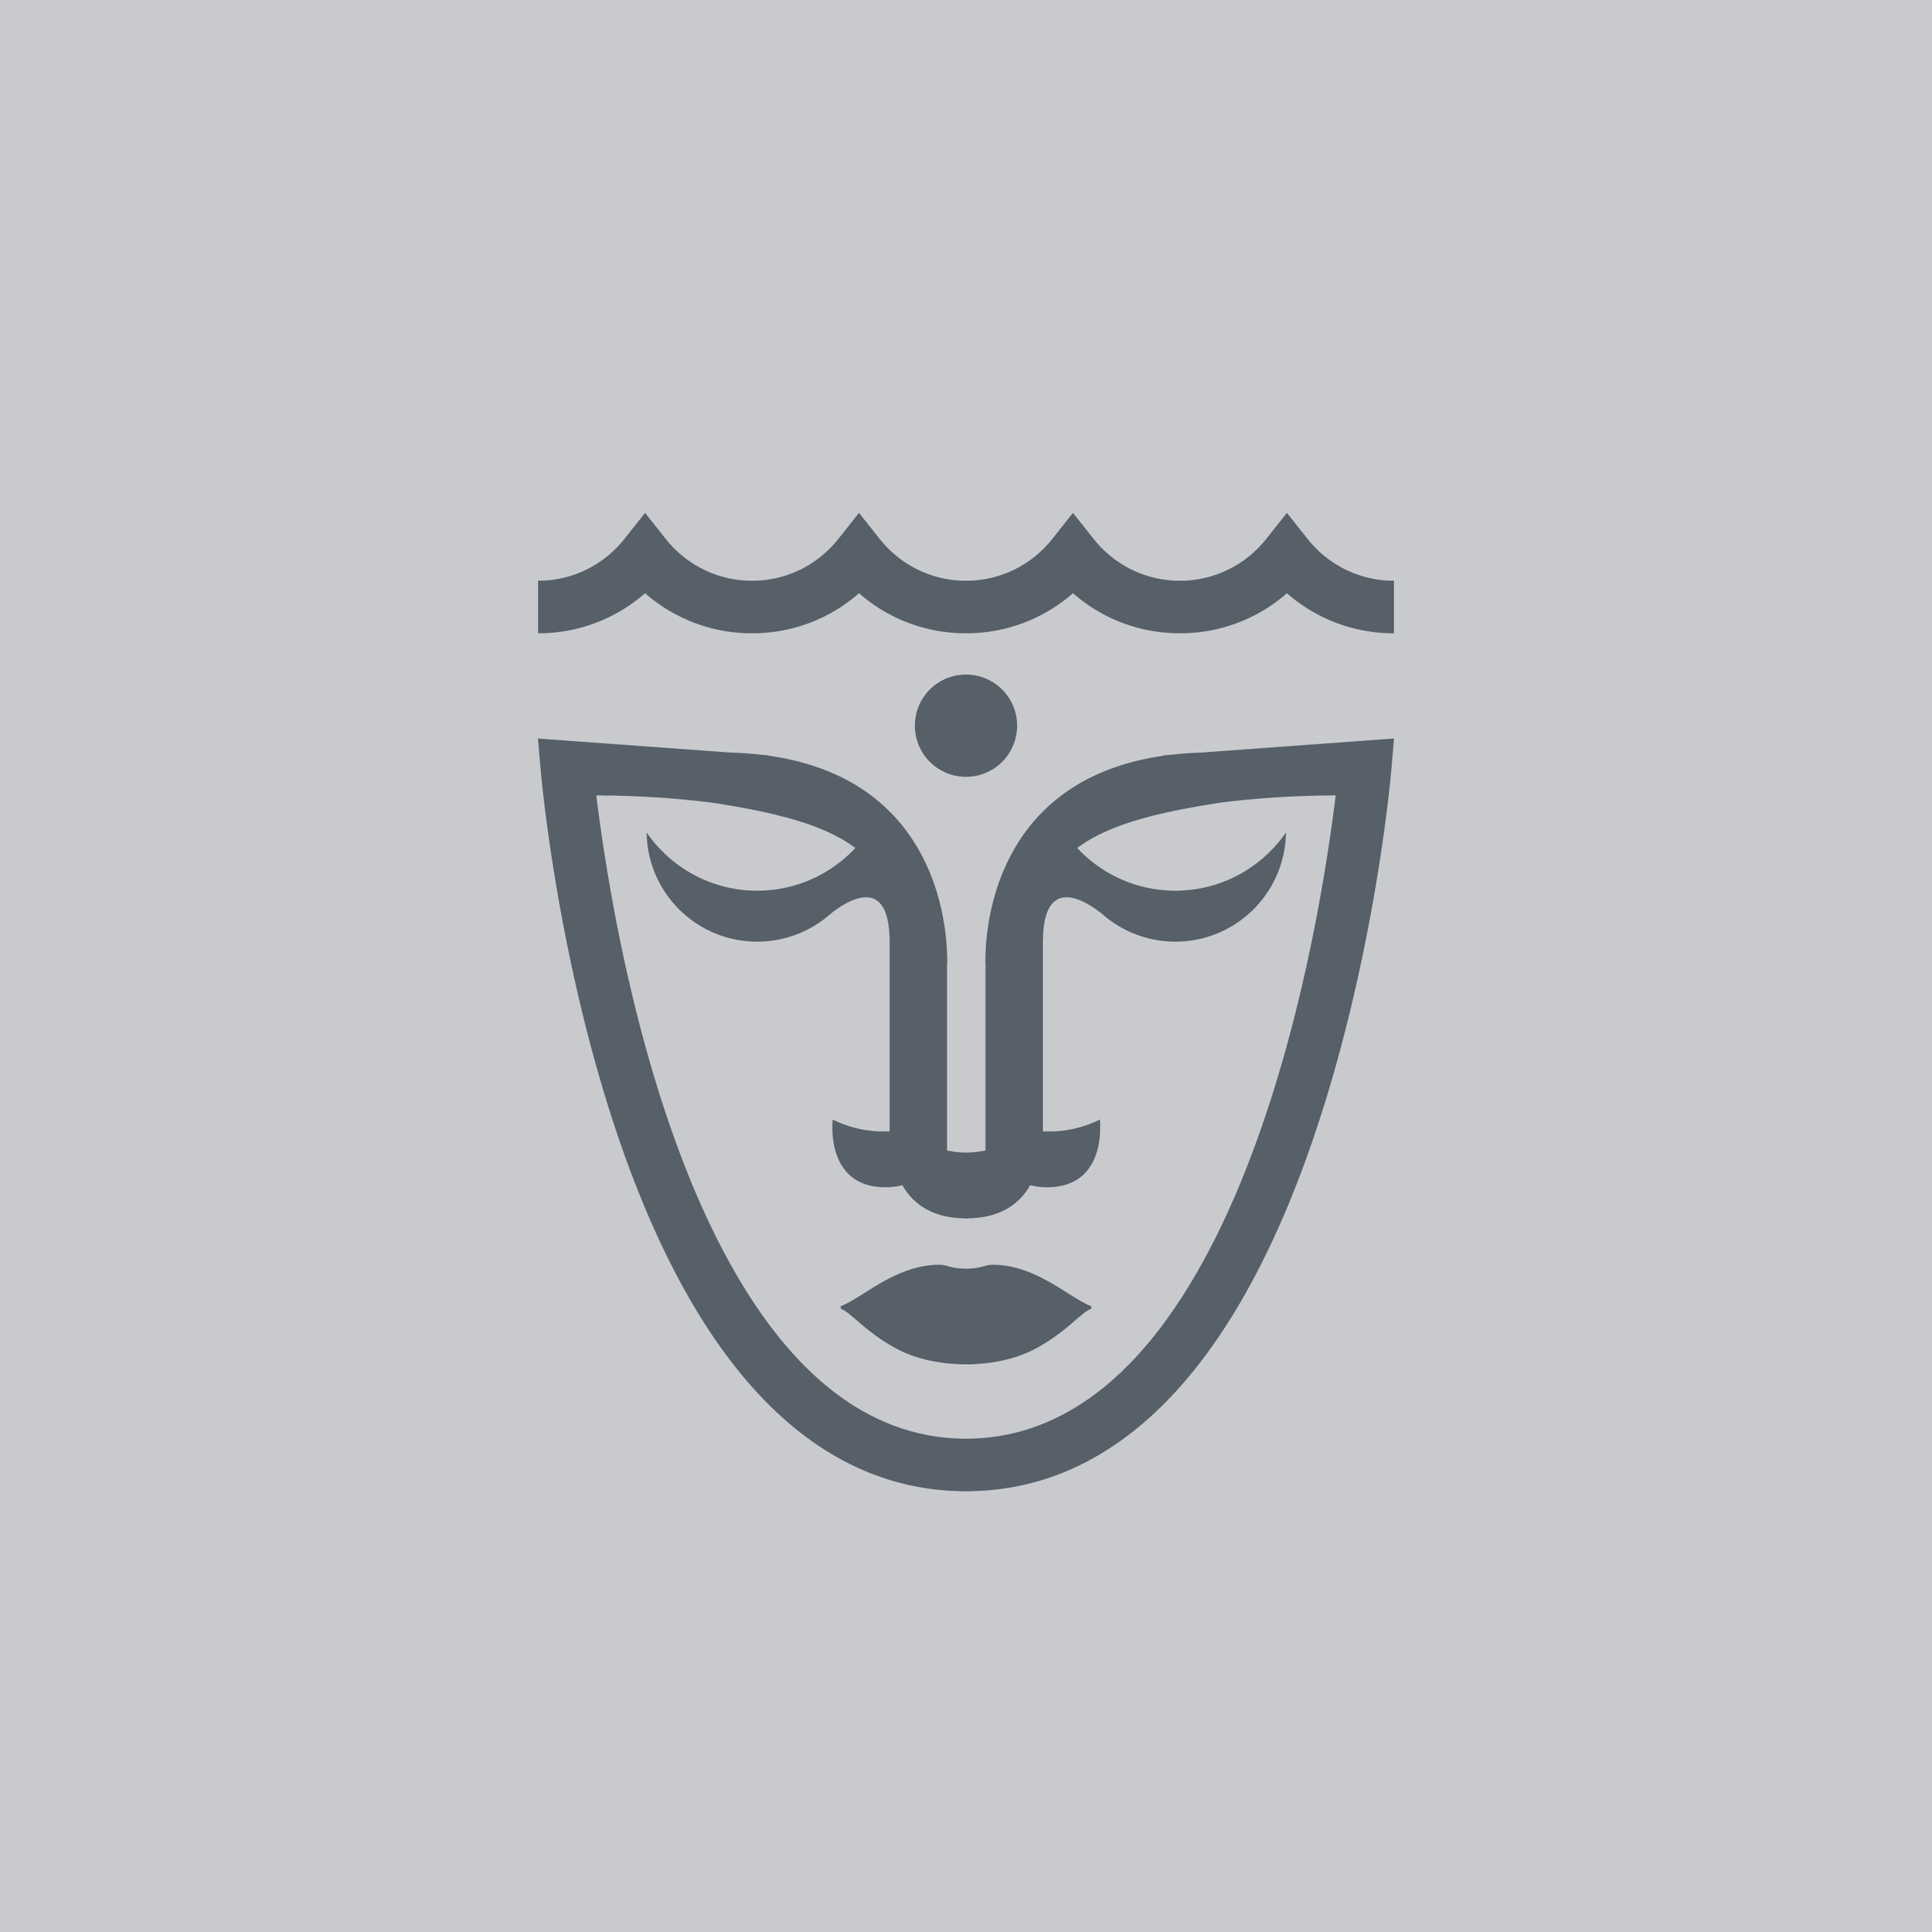 Siddhartha - Hermann Hesse - Designed by Chris Cureton